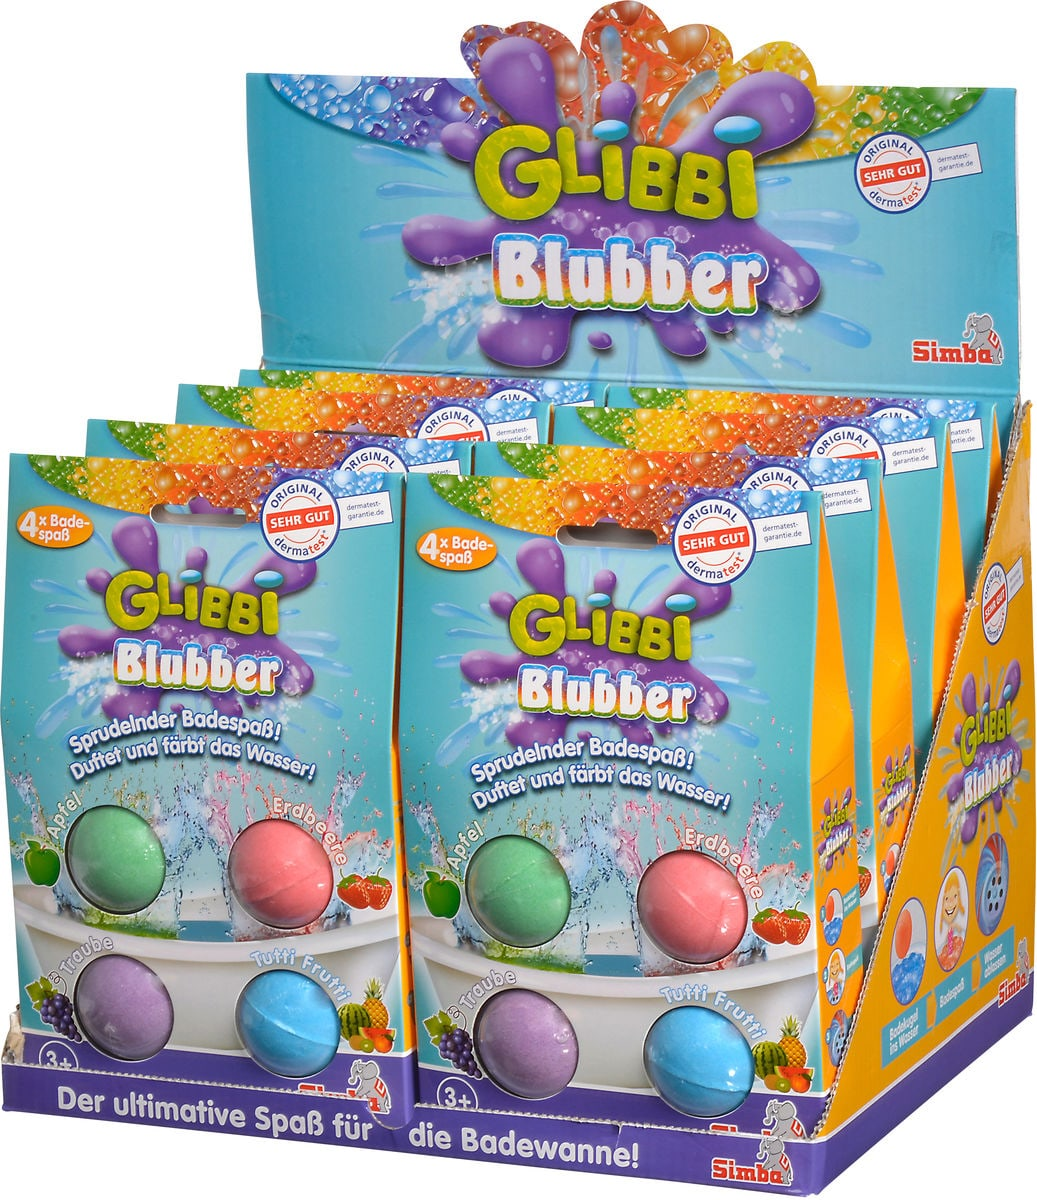 Glibbi Blubber 1 Pack